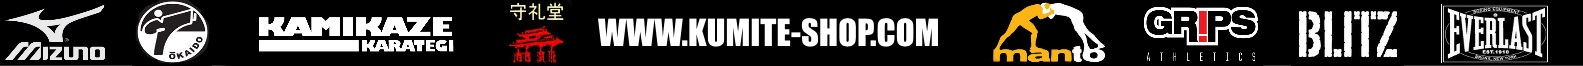 www.kumite-shop.com